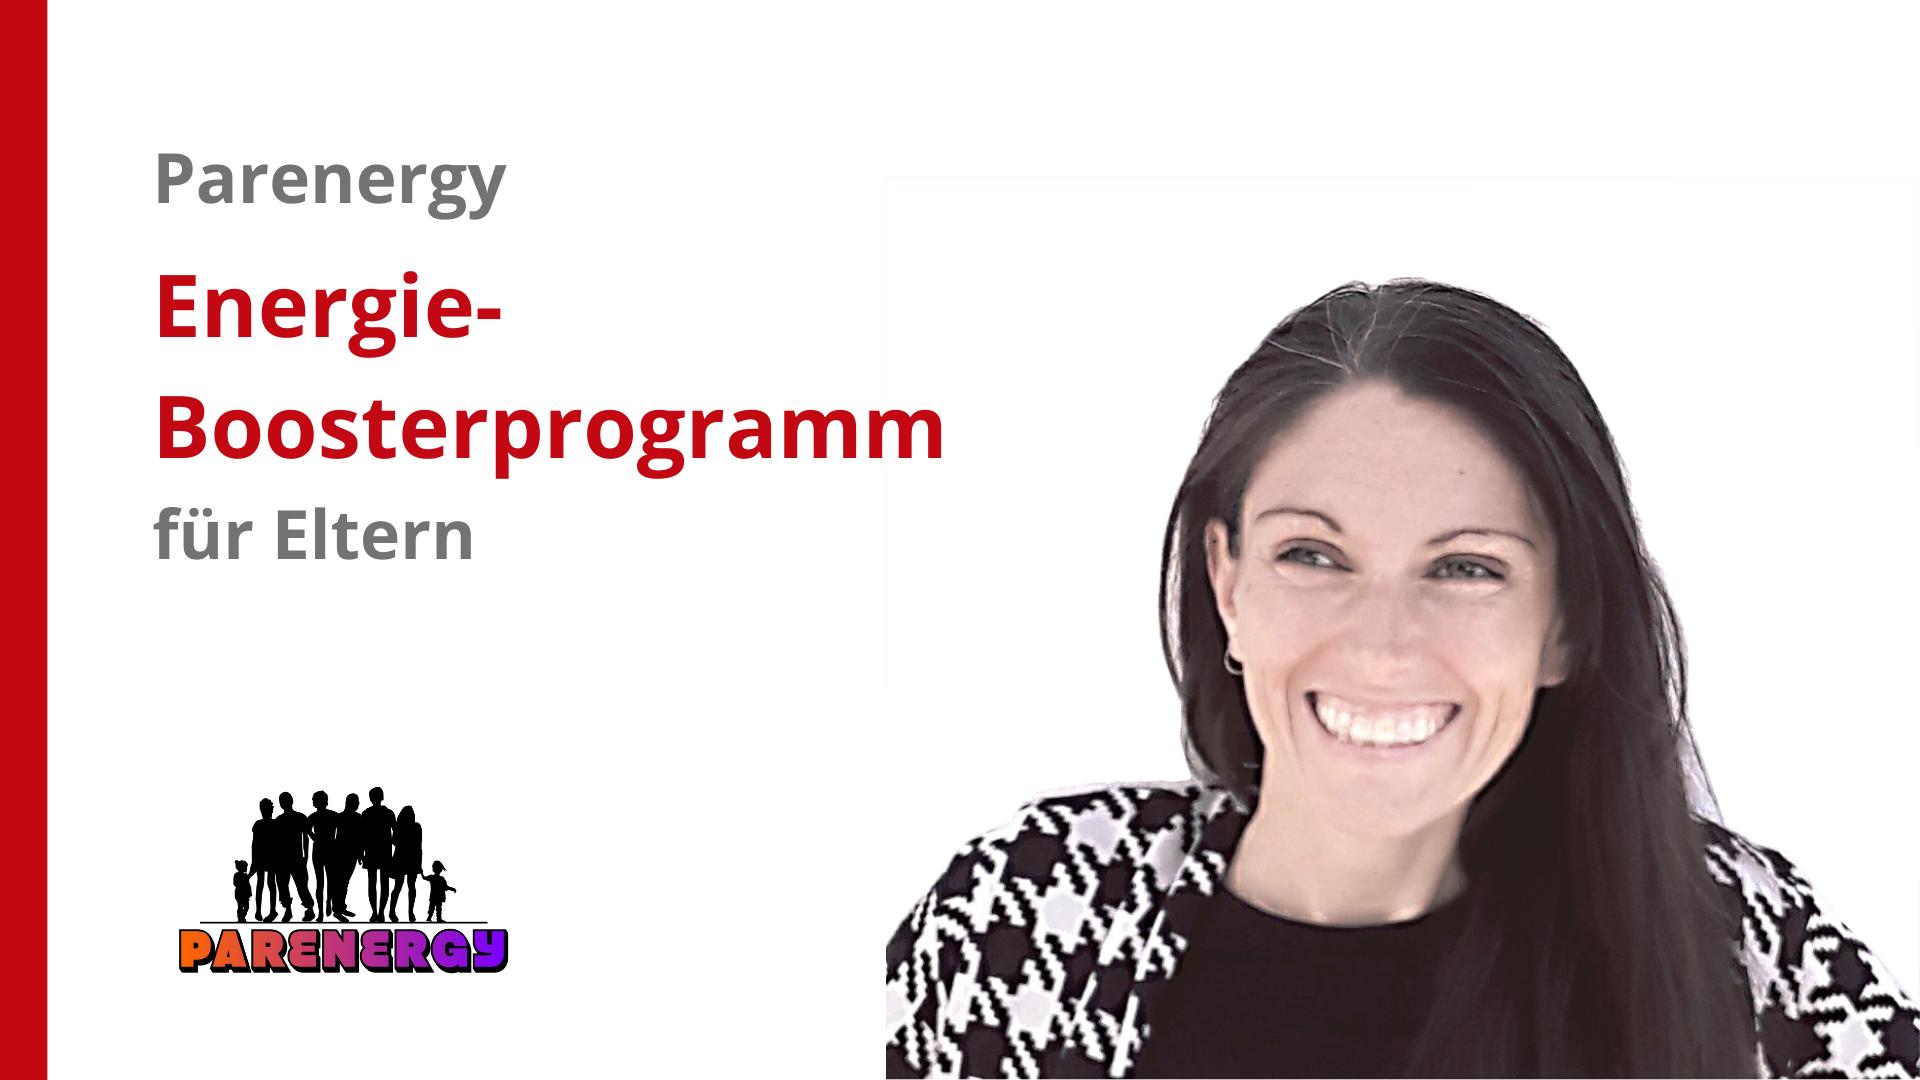 Produktkarte Parenergy Energie-Boosterprogramm